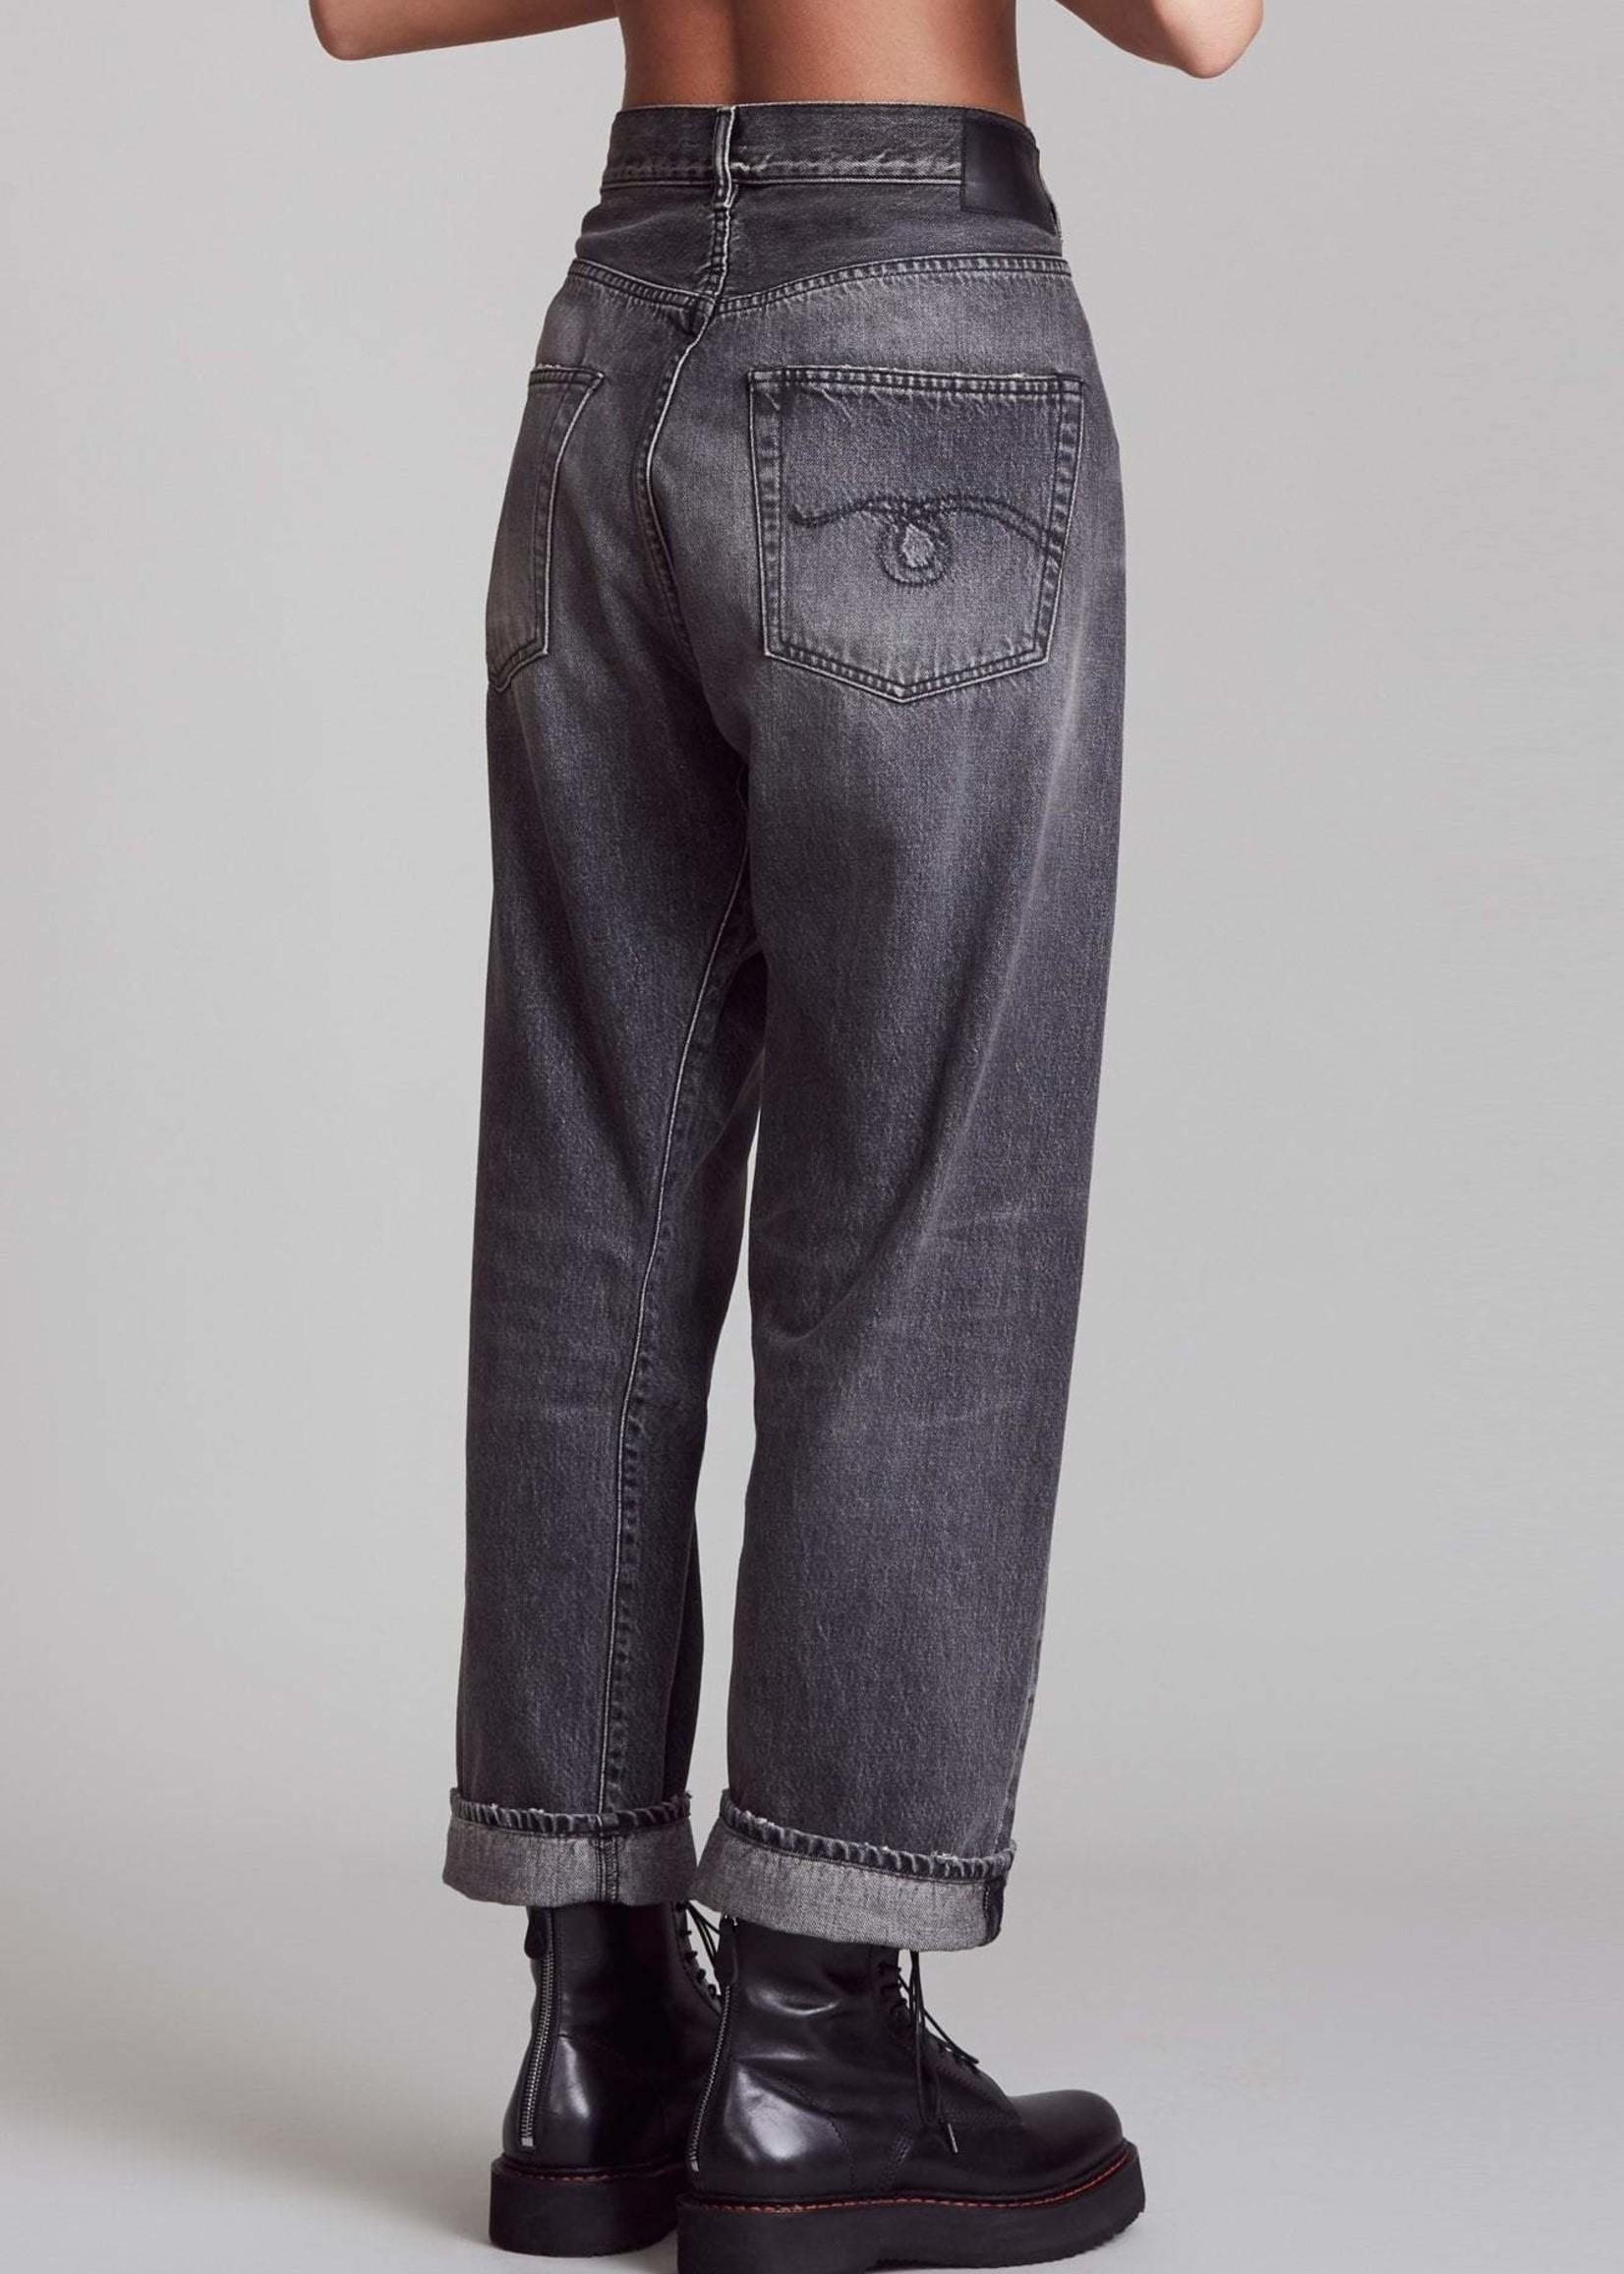 r13 R13 cross over jeans , leyton black